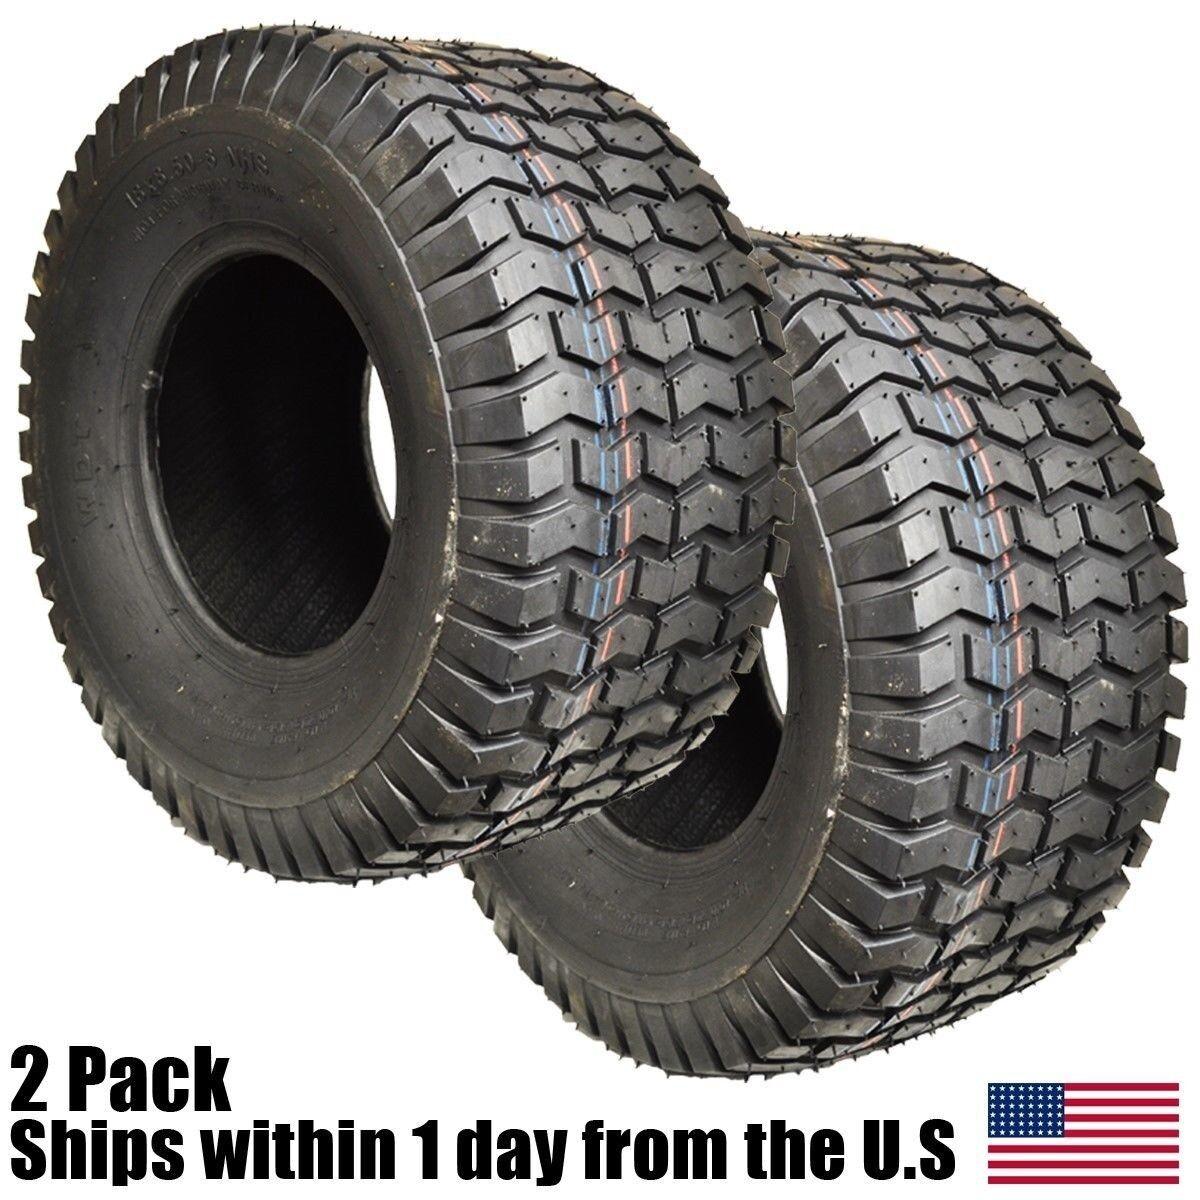 6c41a99e4f22 2PK Tires 23 10.50-12 Lawnmower Golf Cart Tire 4 PLY 아이템 넘버  302461624837.